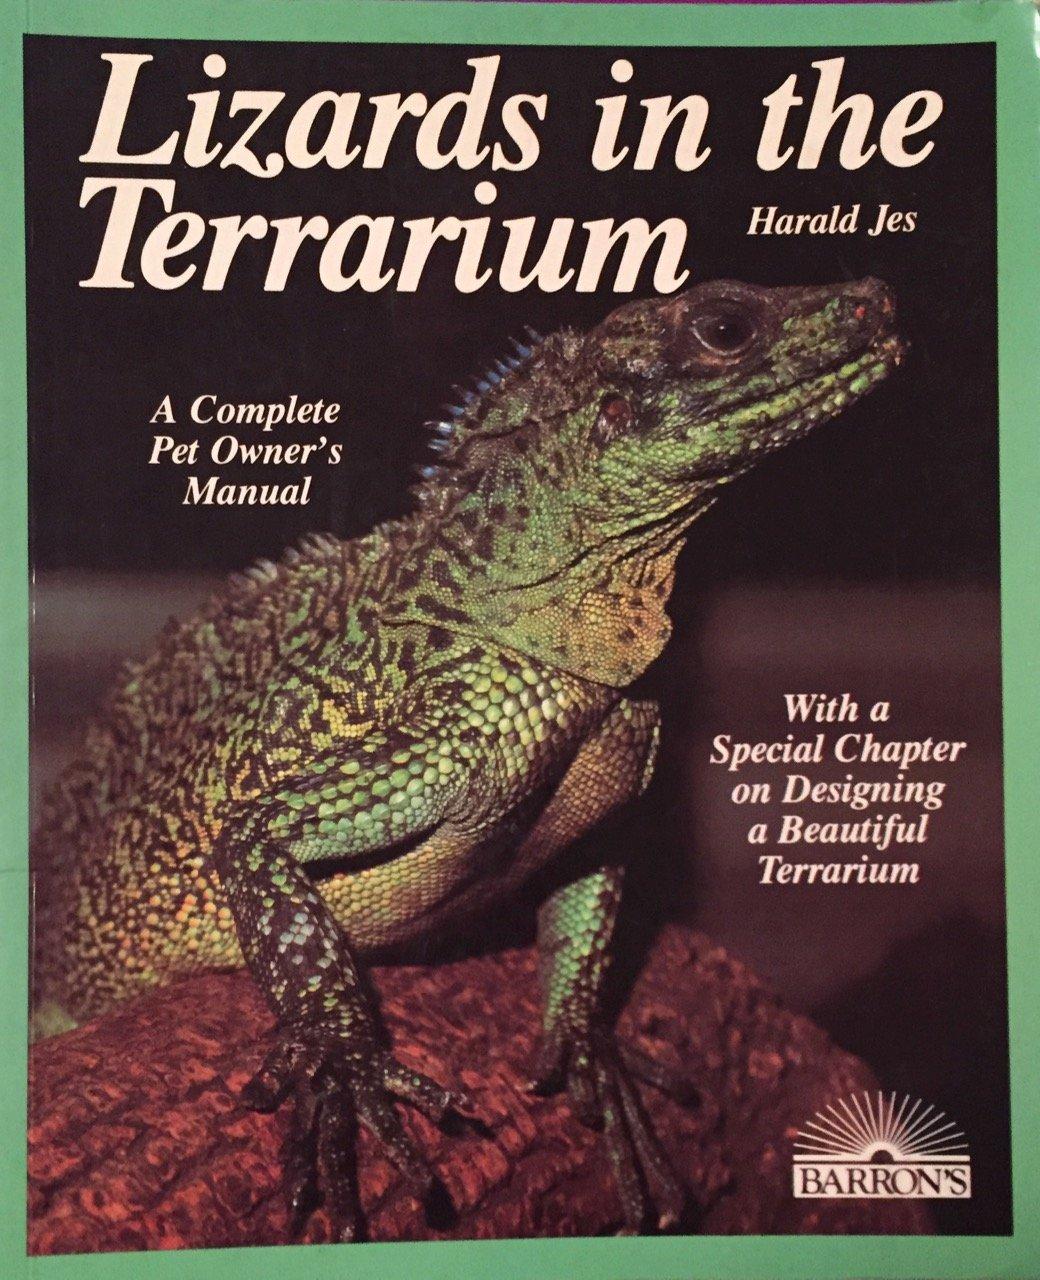 Amazon.com : Barrons Books Lizards in the Terrarium Book : Pet Habitat  Supplies : Pet Supplies